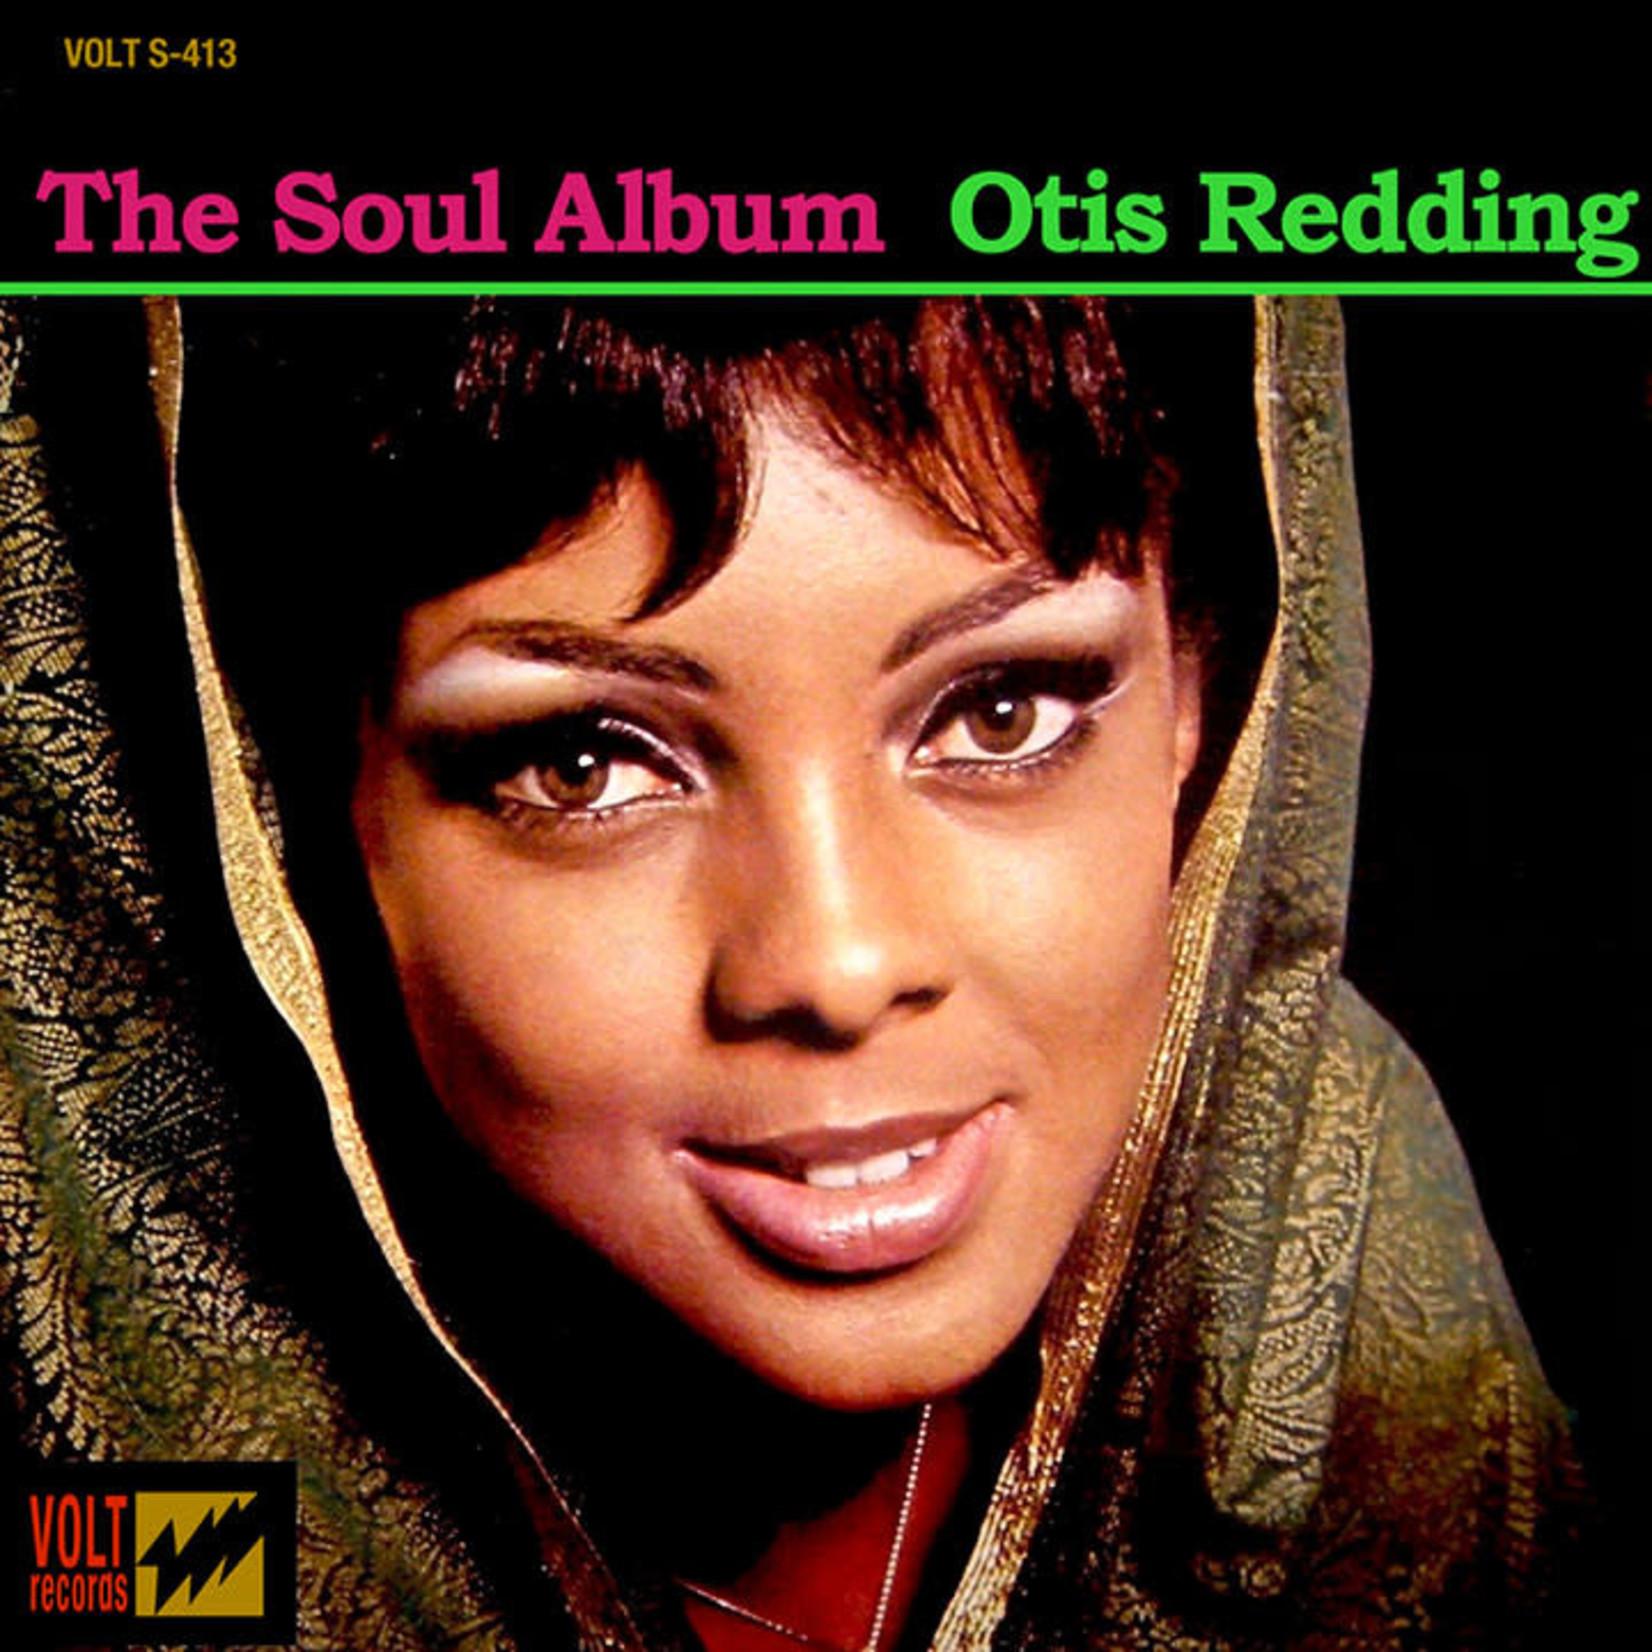 Vinyl Otis Redding - The Soul Album